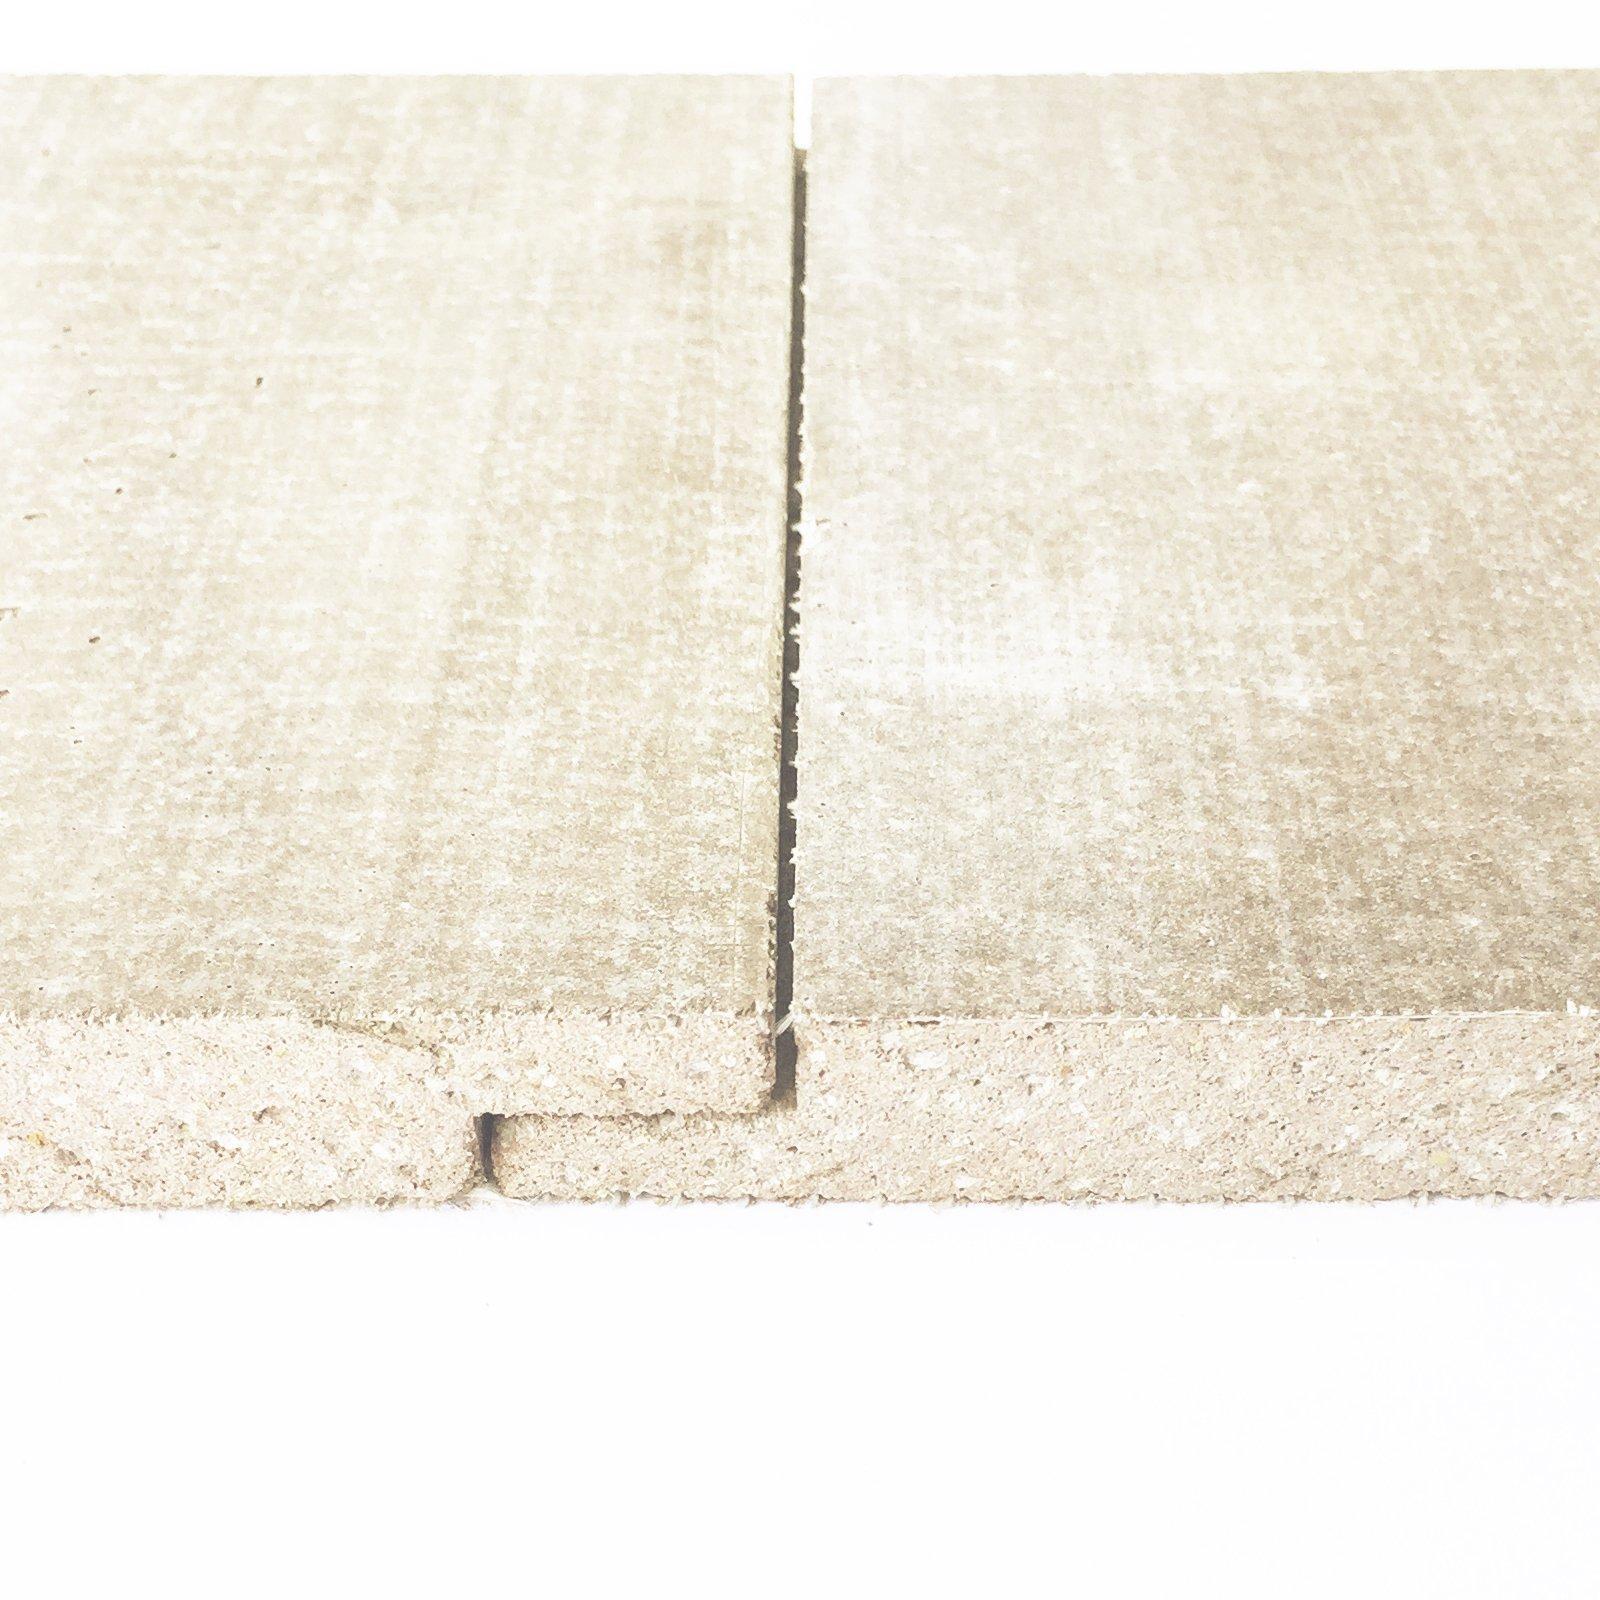 Maglok Dragon 2000 x 1200 x 20mm Flooring Board